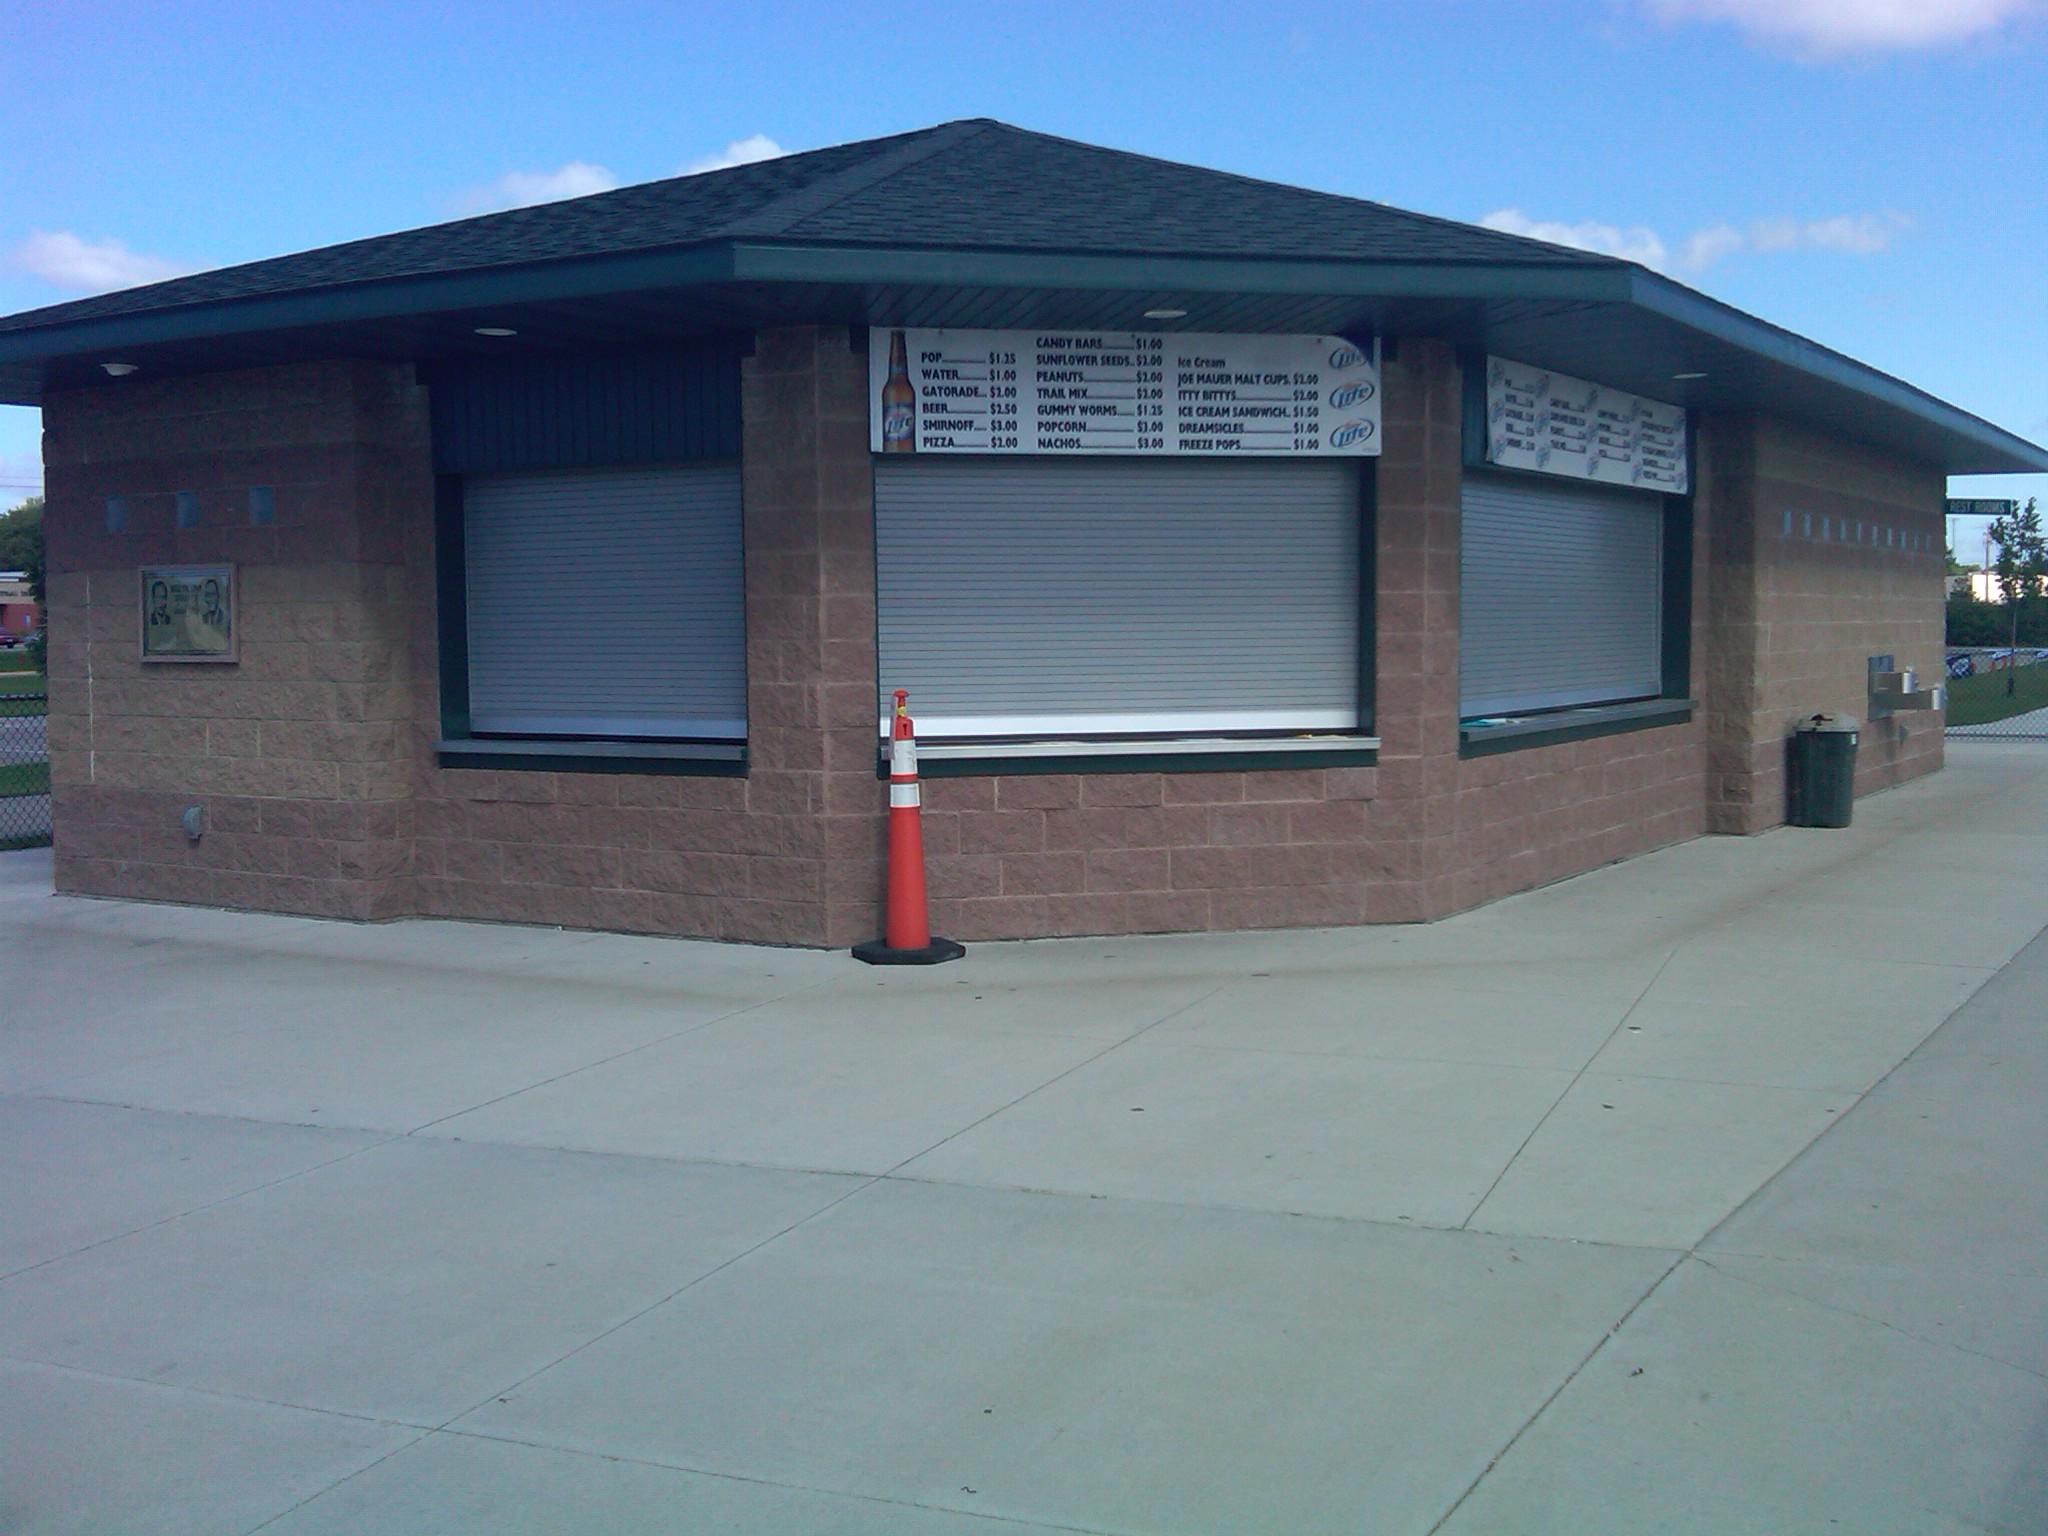 Concession stand at Bill Taunton Stadium in Willmar, MN